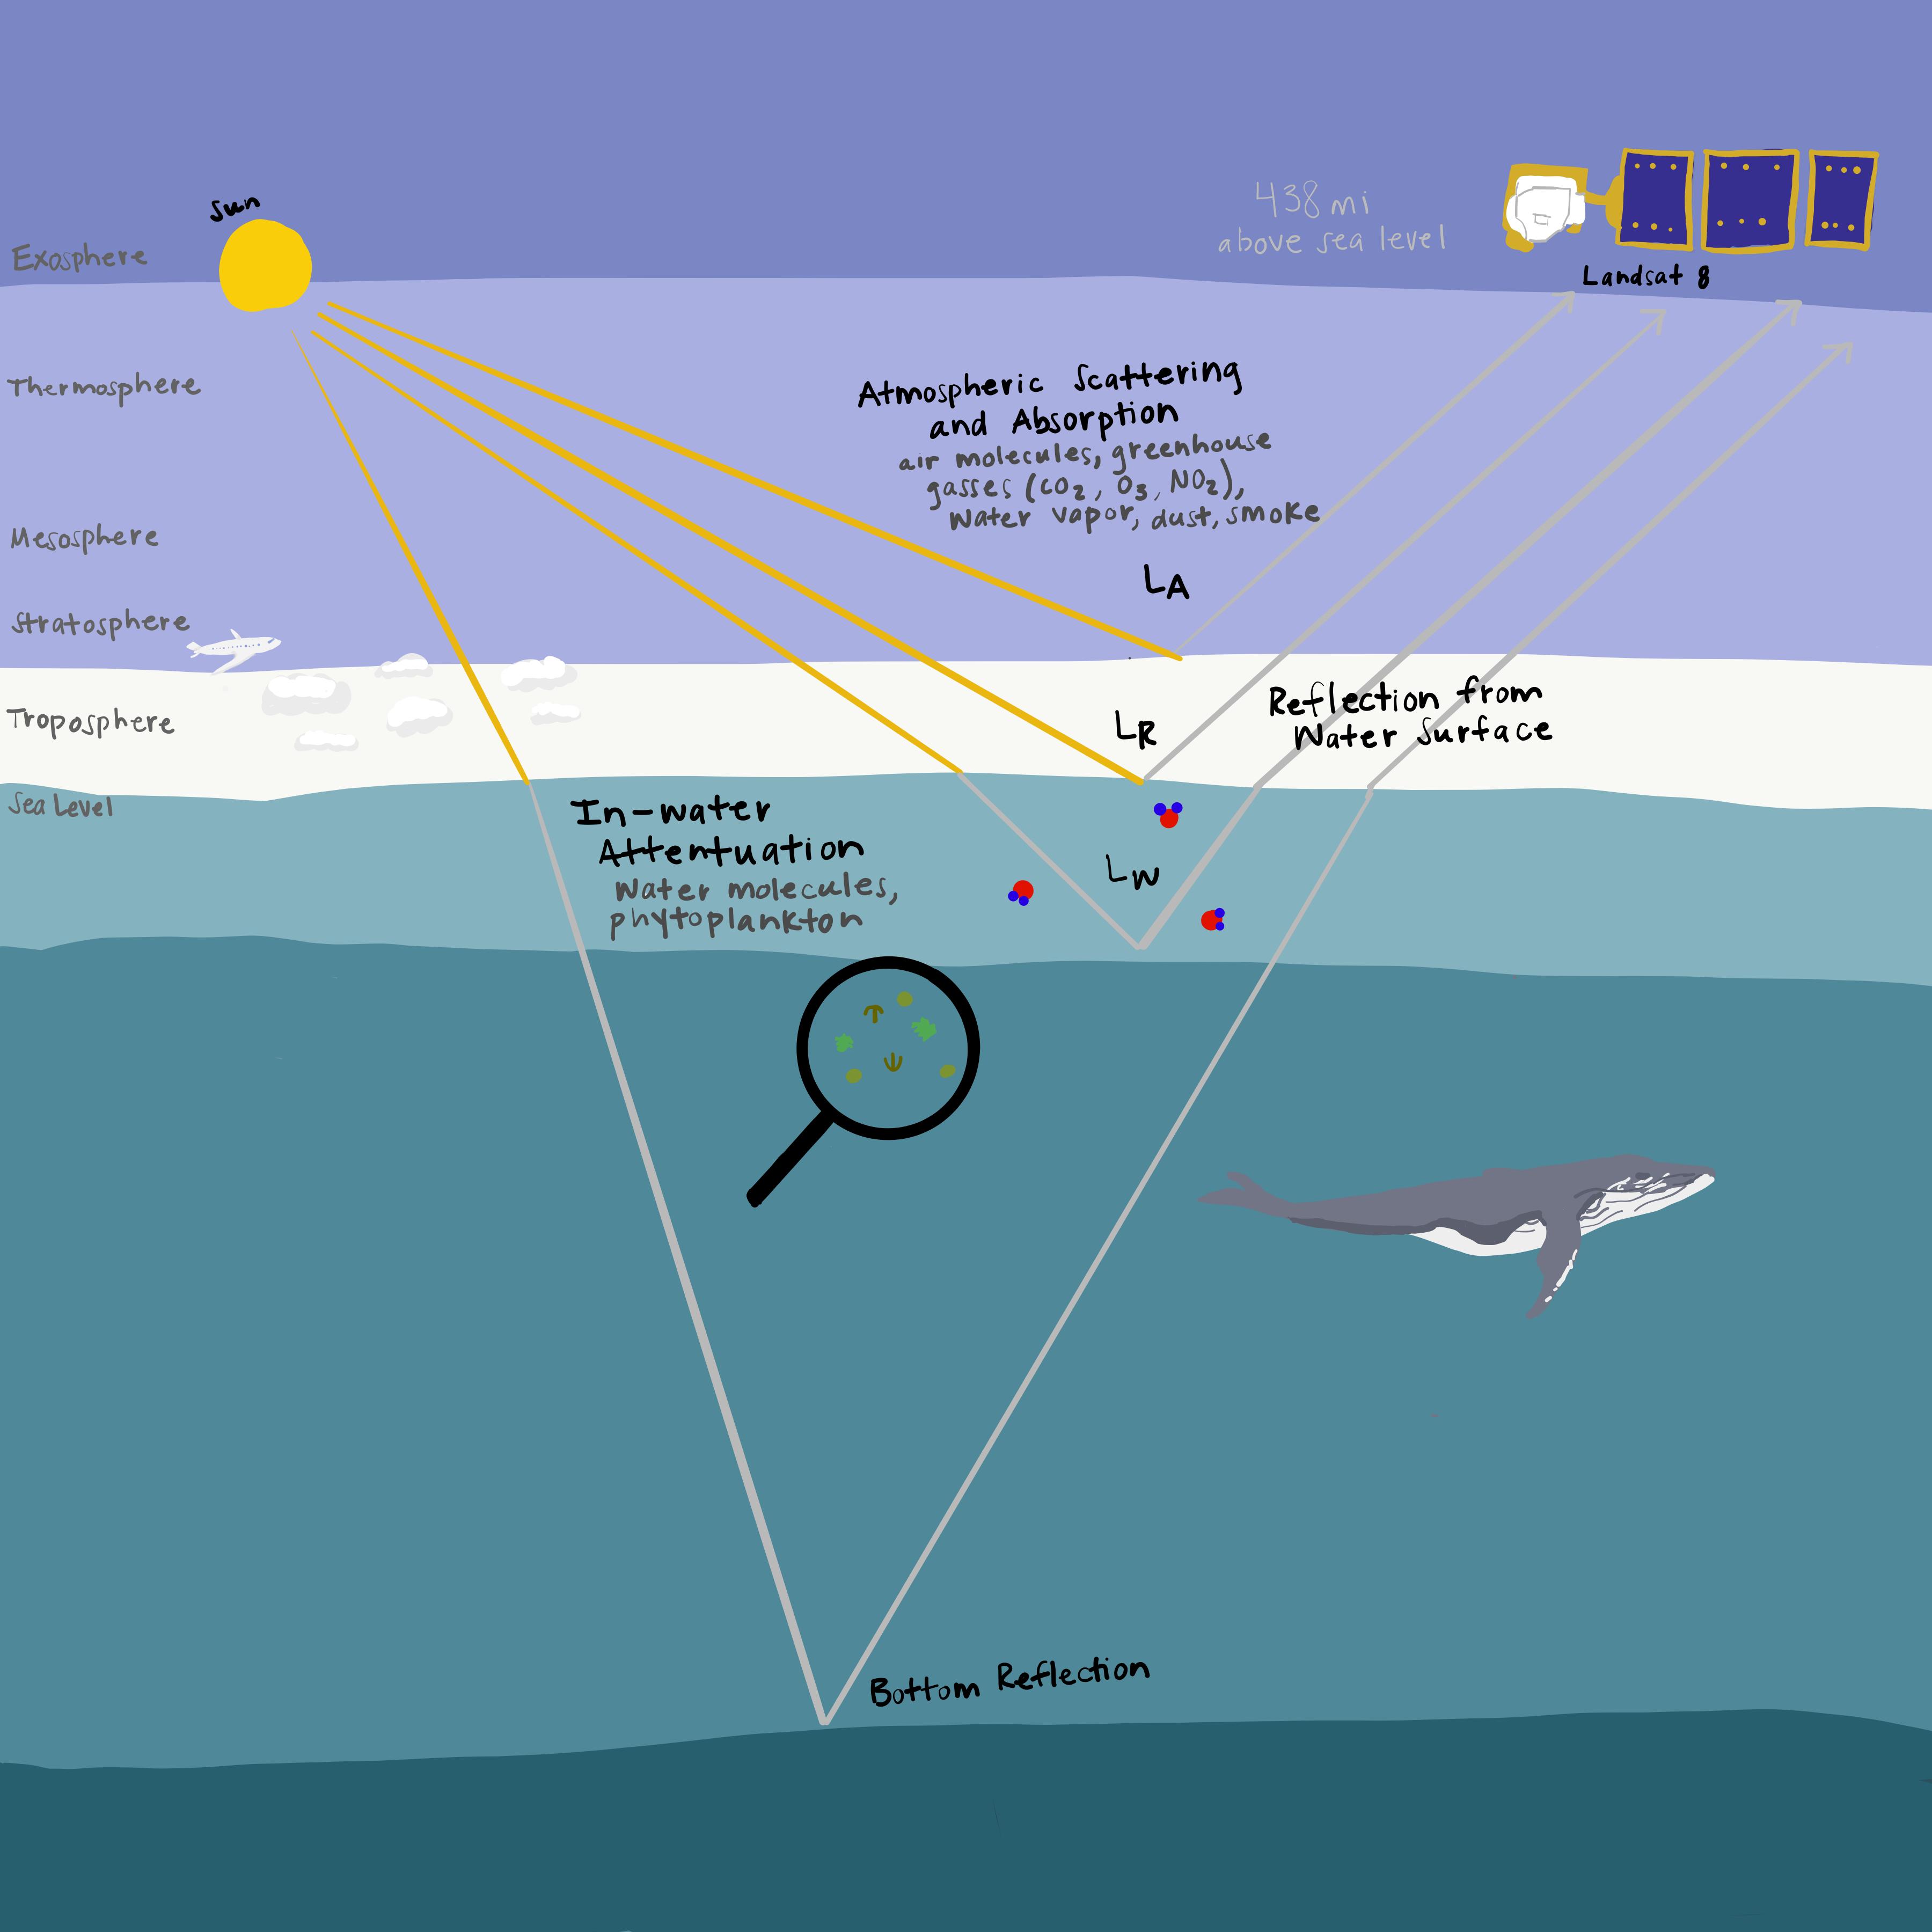 Diagram of how satellite imaging works.